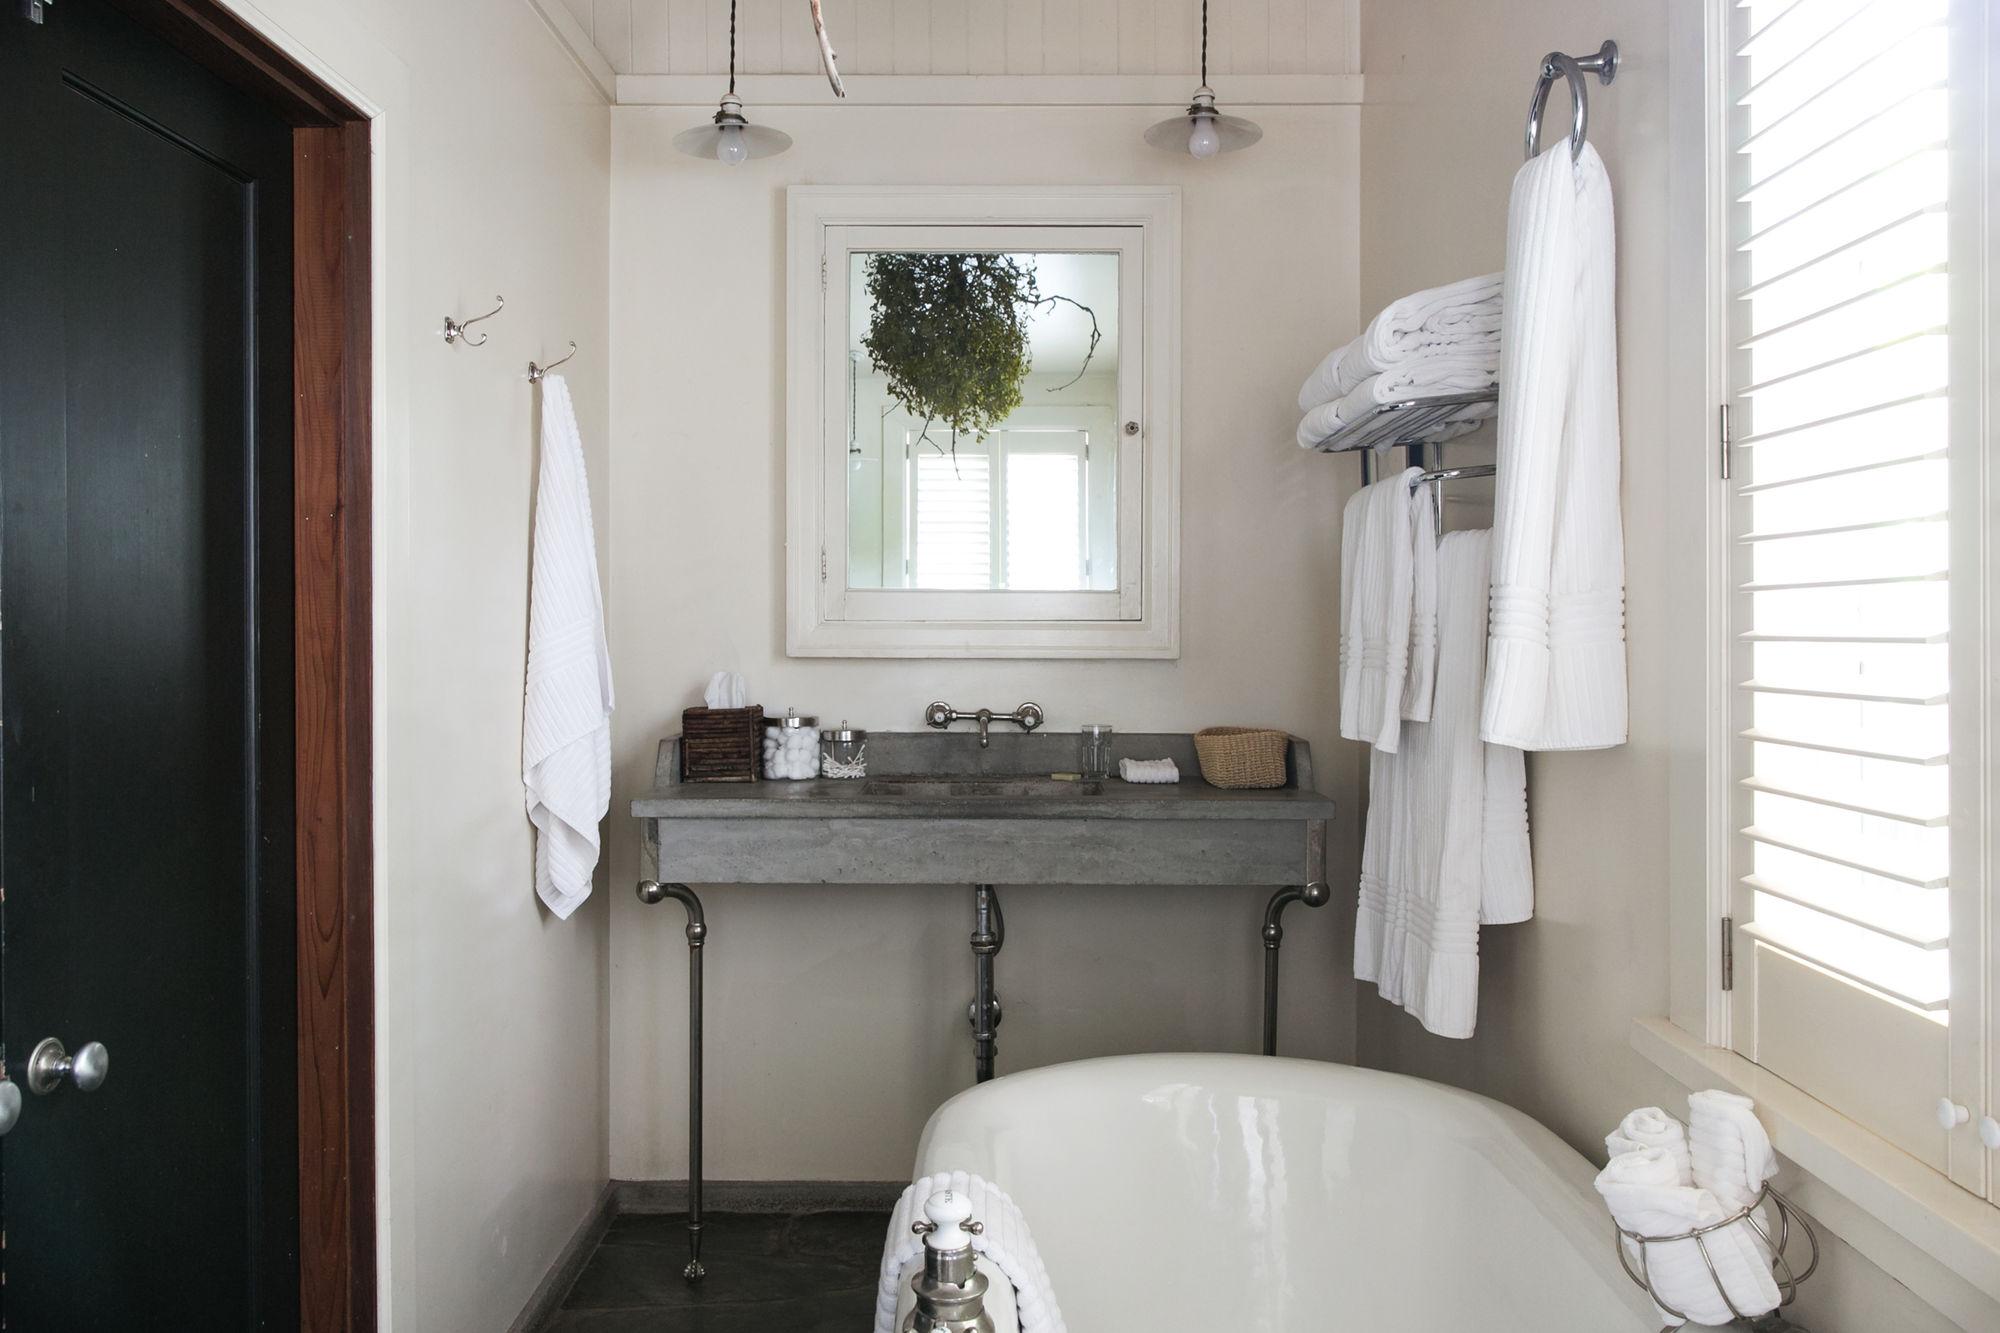 badkamer opbergen tips handdoekenrek wand